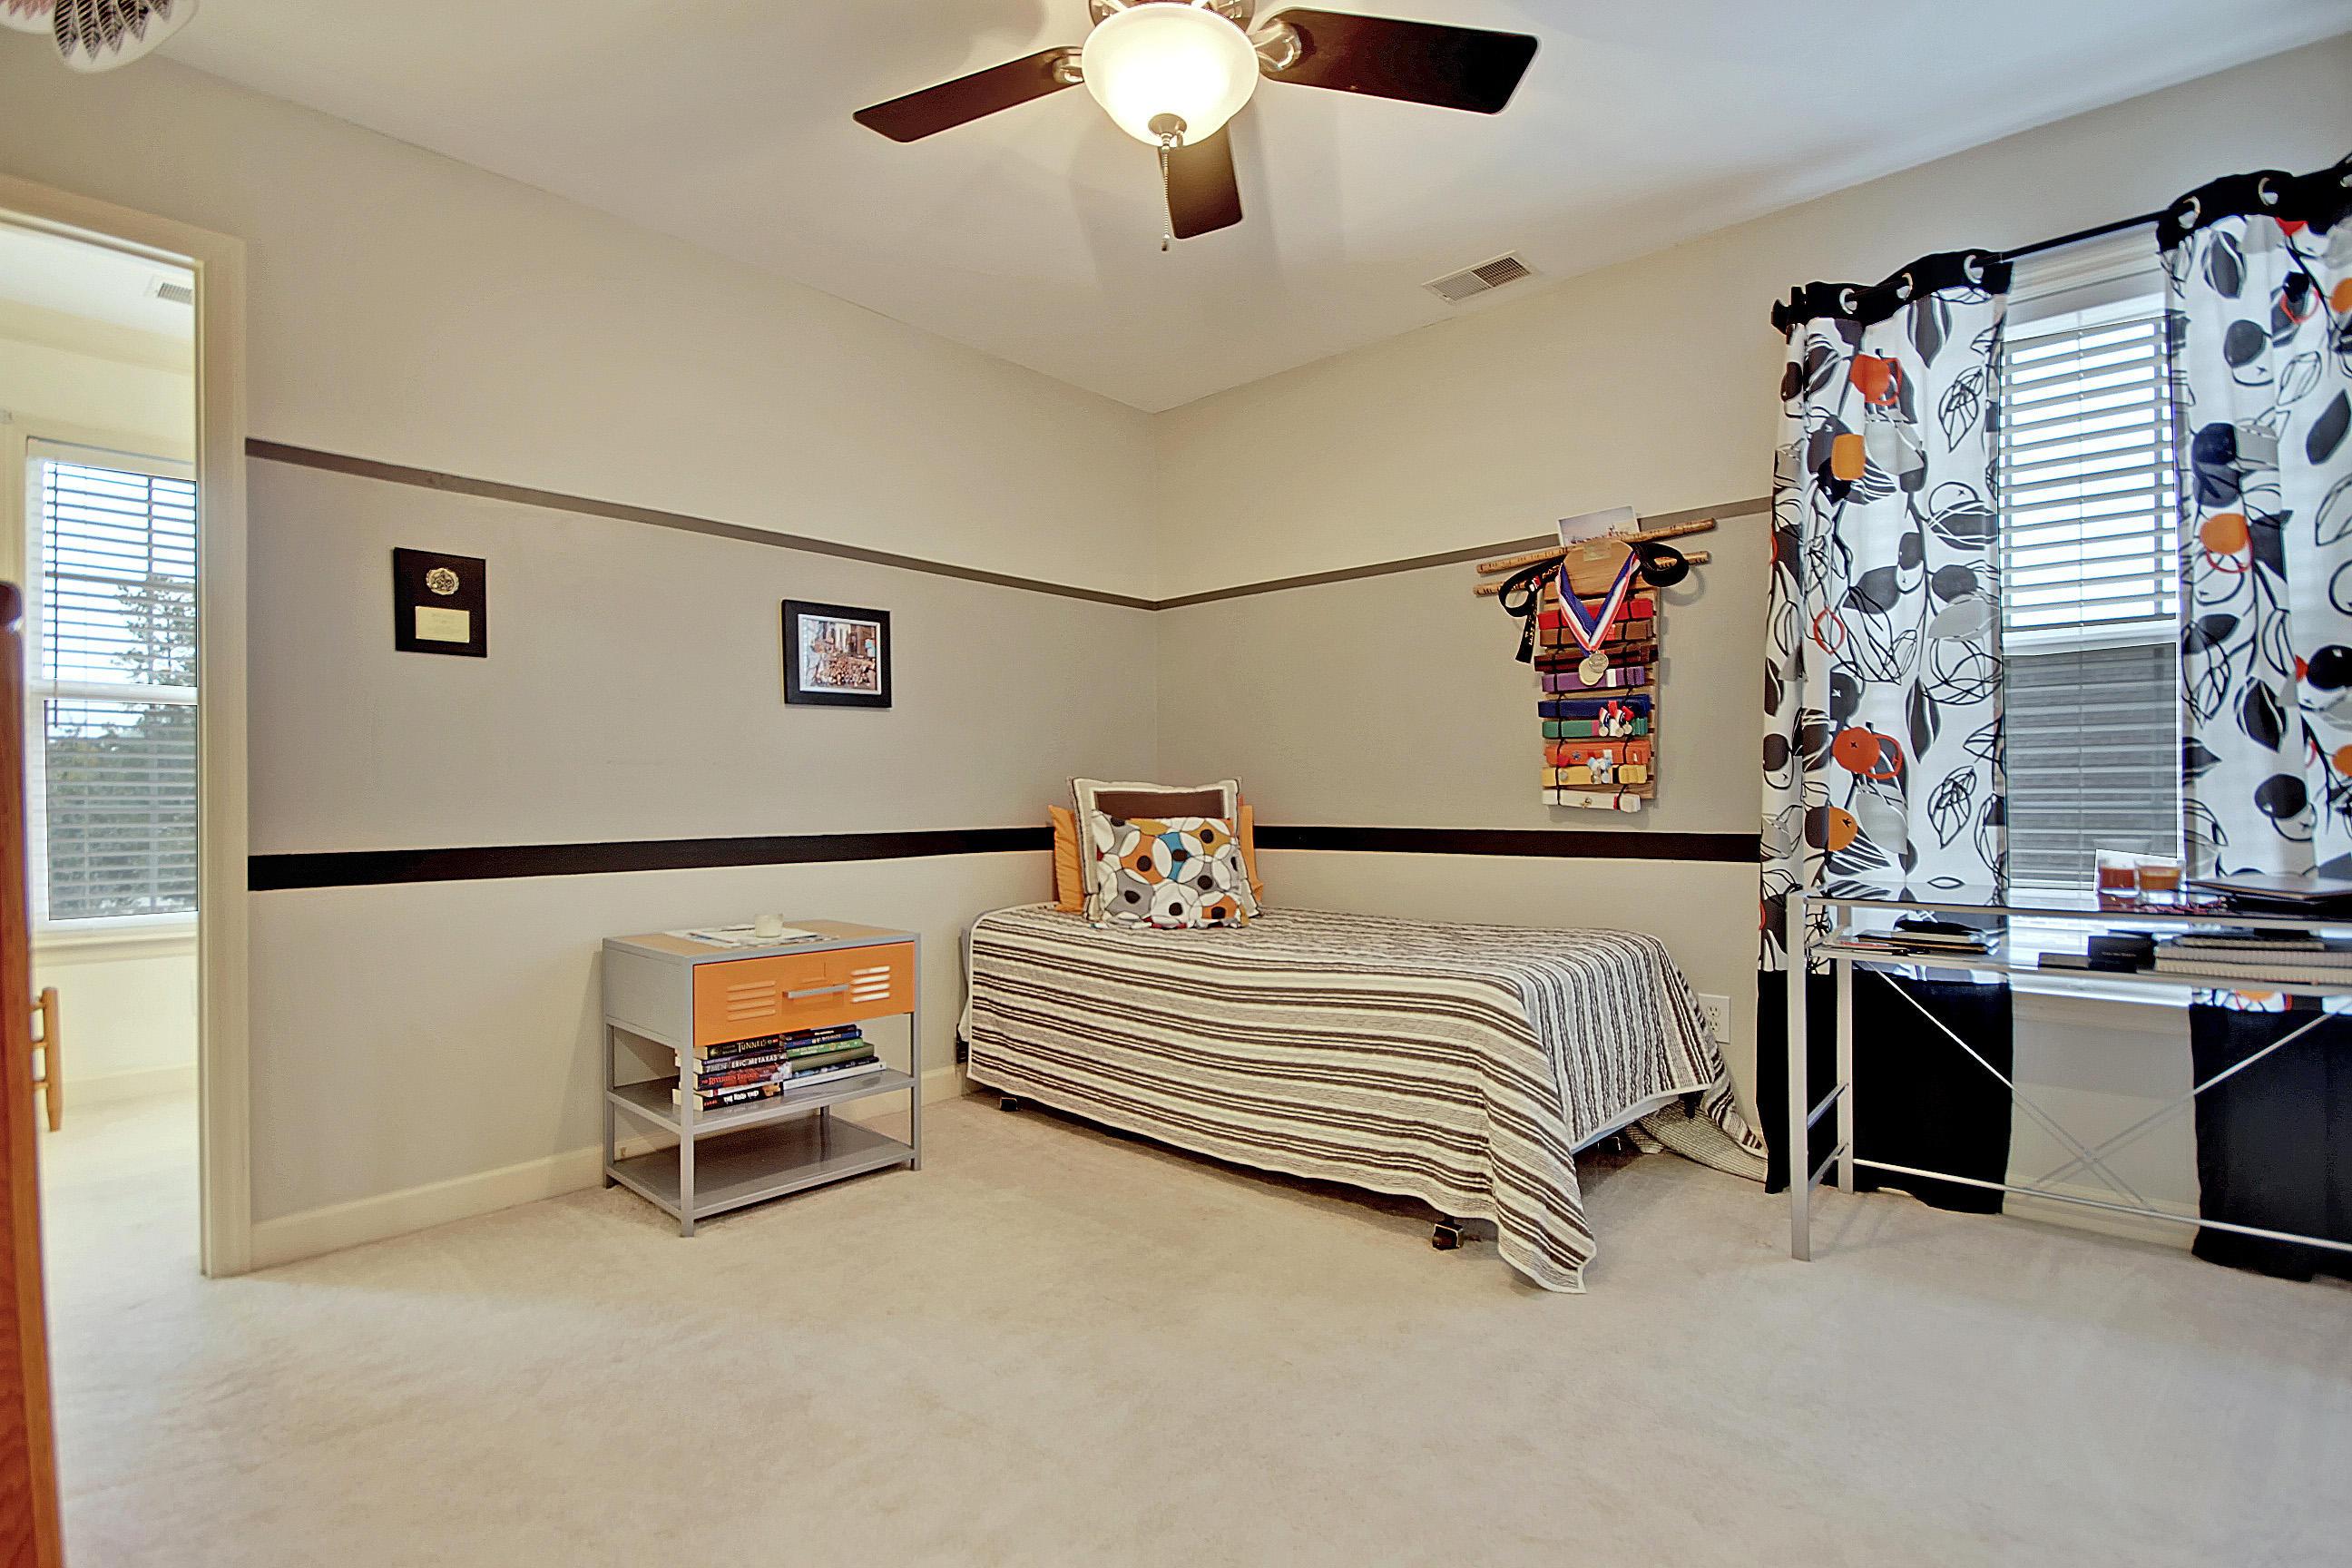 Dunes West Homes For Sale - 2449 Darts Cove, Mount Pleasant, SC - 27